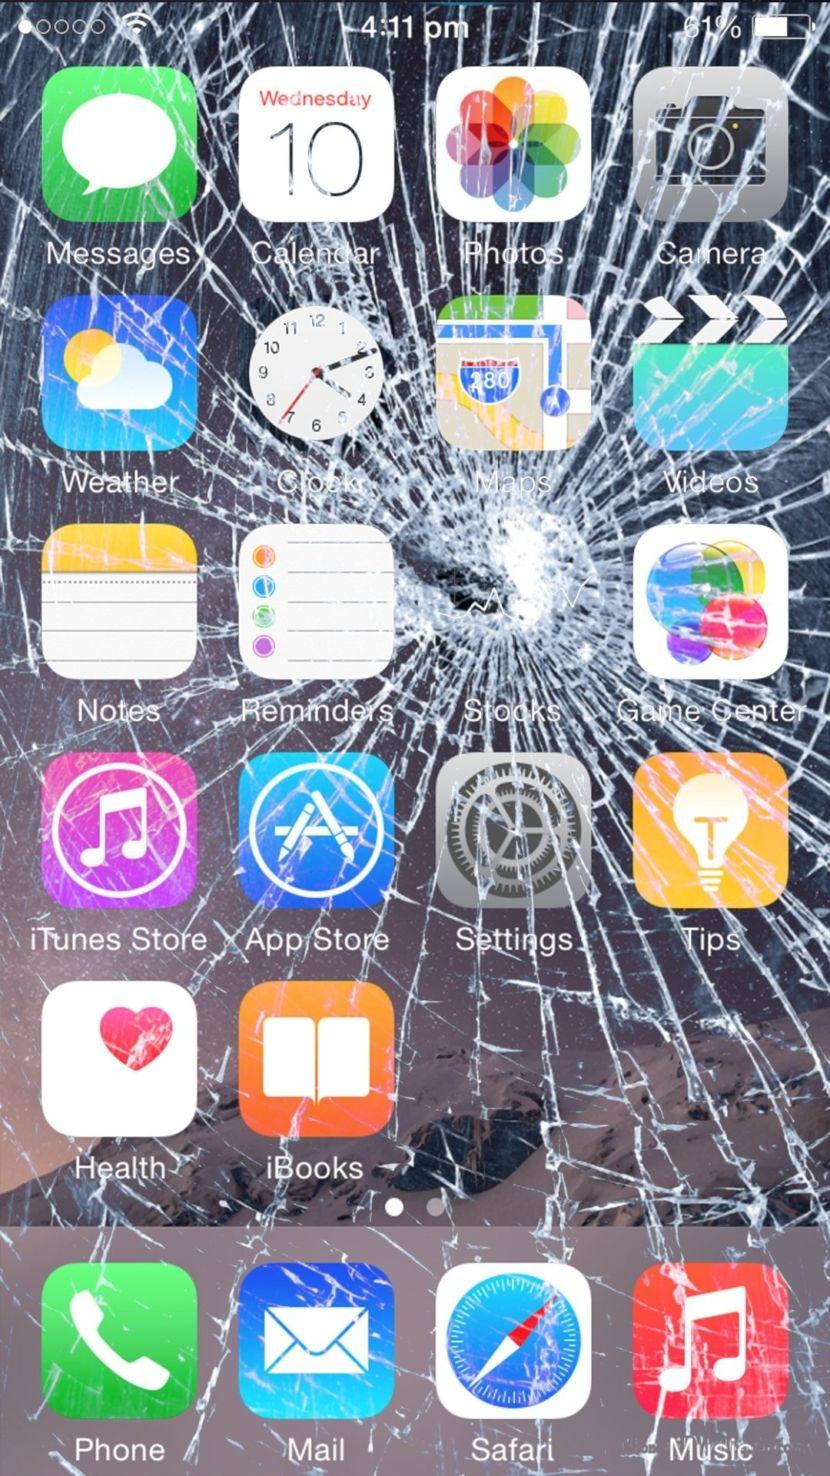 7 Broken Screen Wallpapers Prank For Apple Iphone Fundos De Tela Iphone Papel De Parede Do Telefone Papel De Parede Samsung